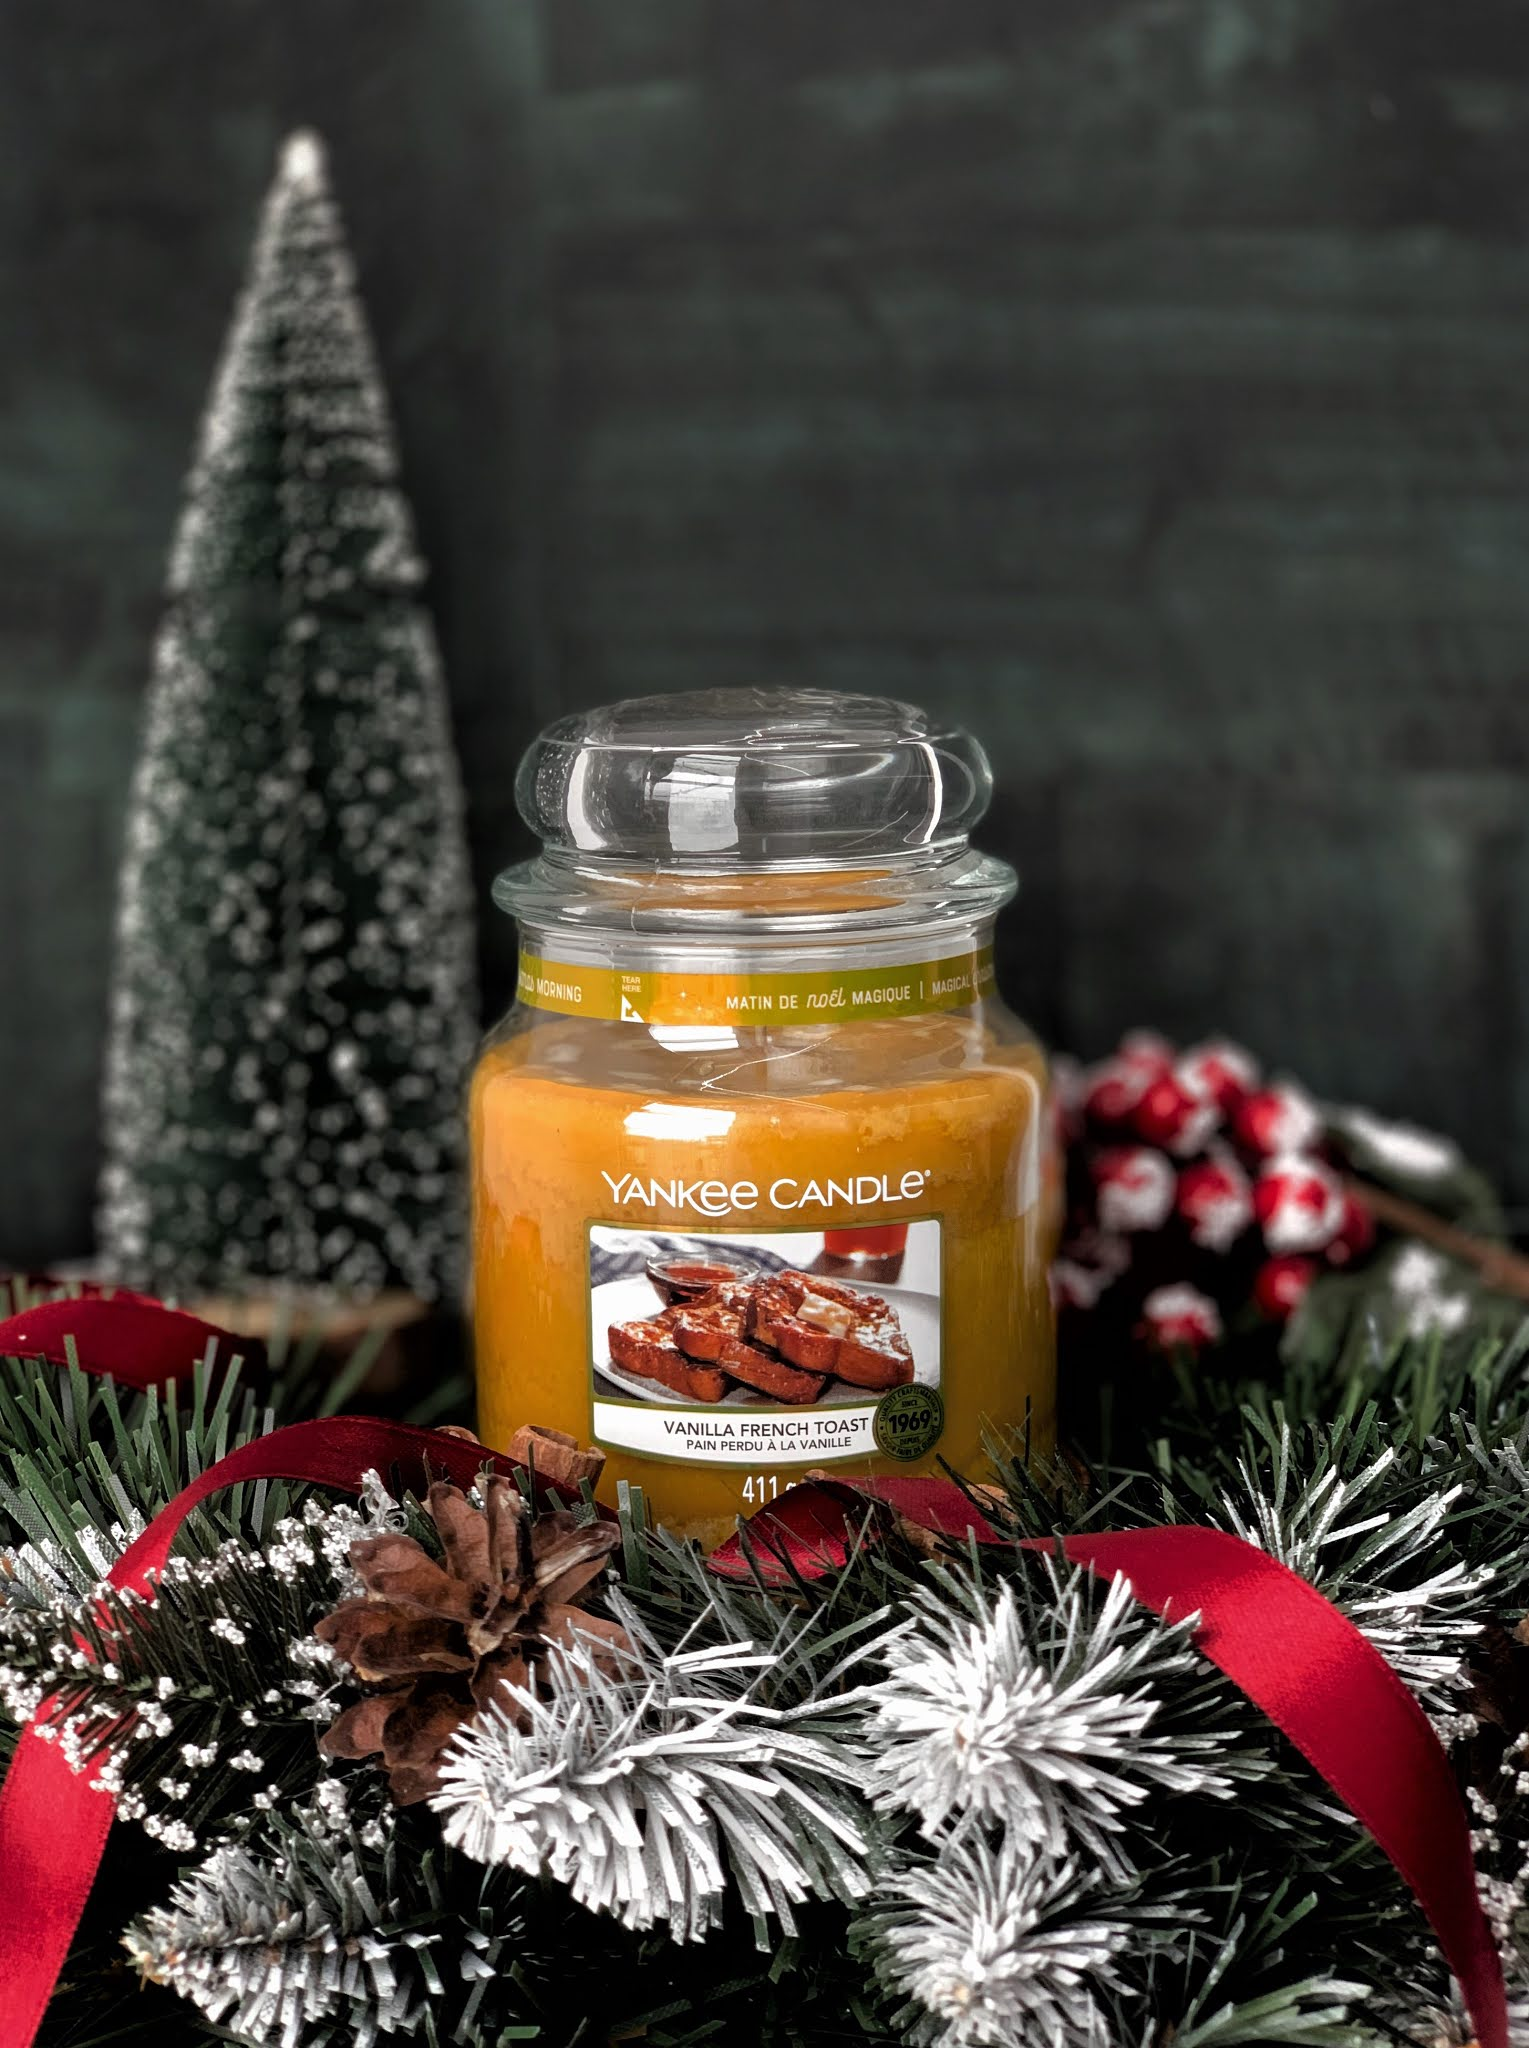 Vanilla-French-Toast-Yankee-Candle